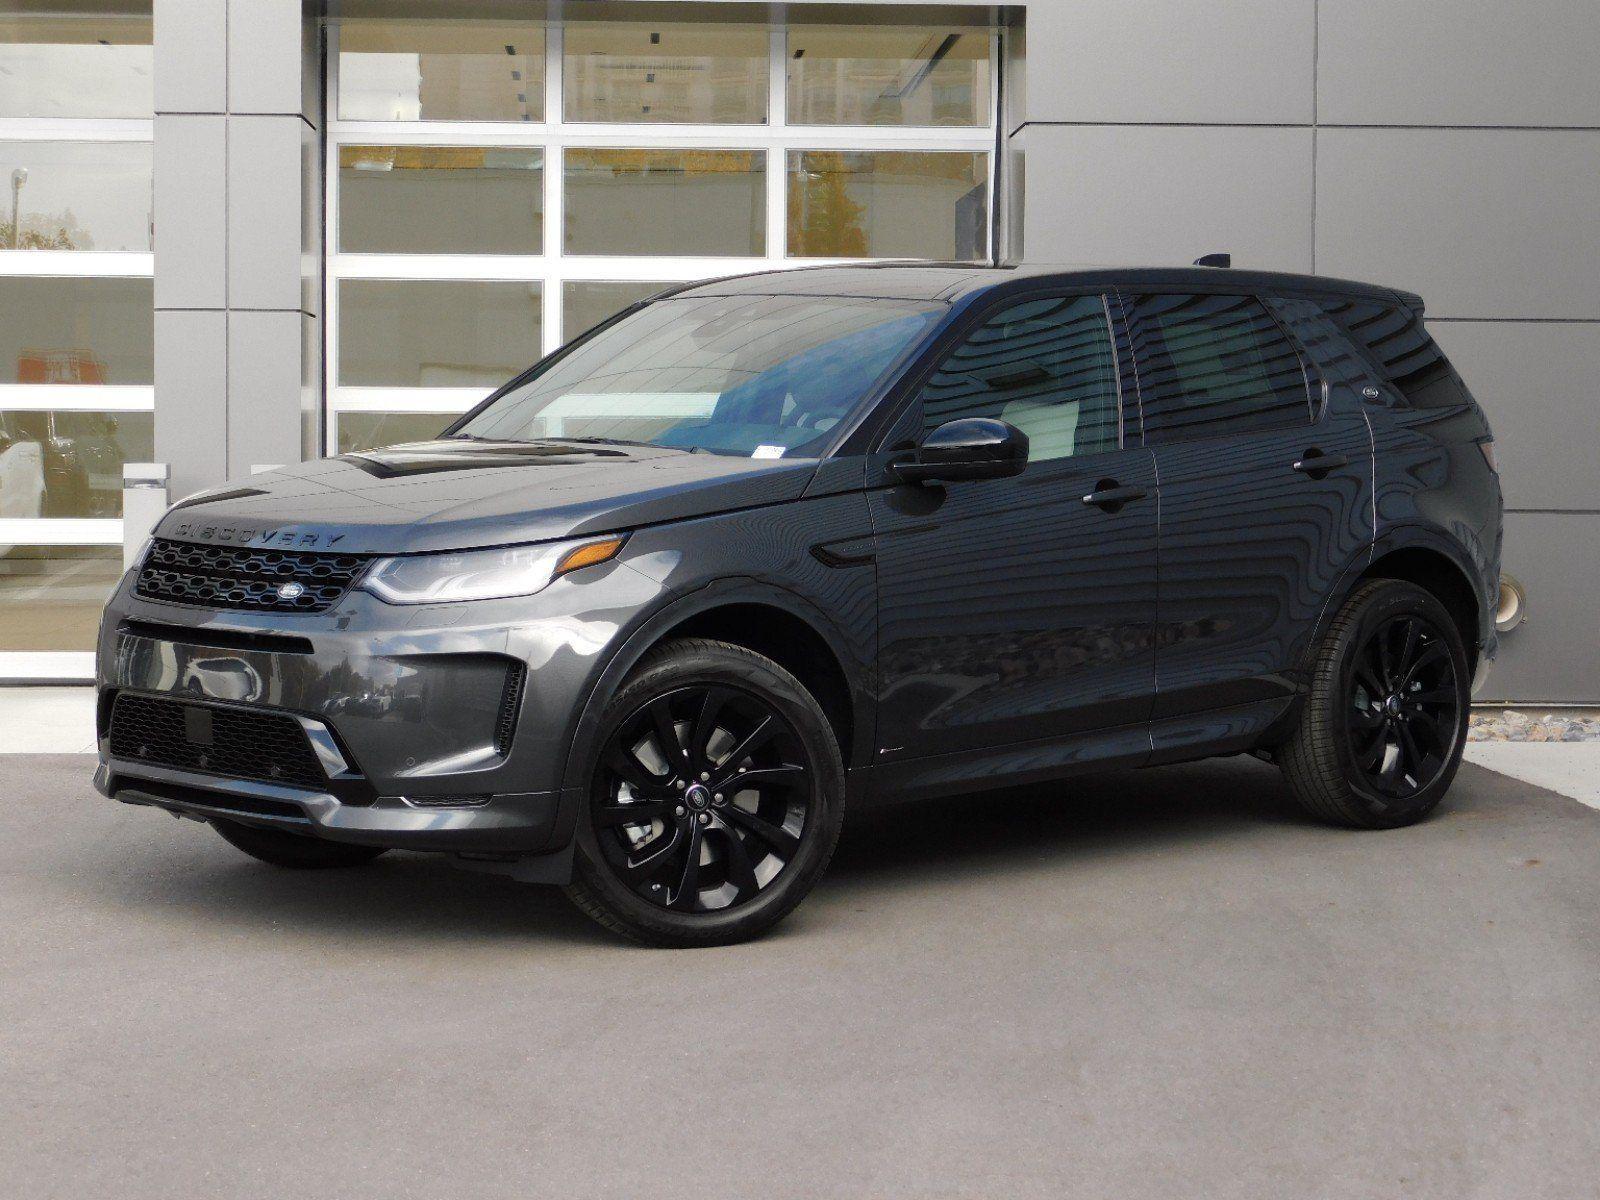 Land Rover Defender 2021 Price In Pakistan ayam